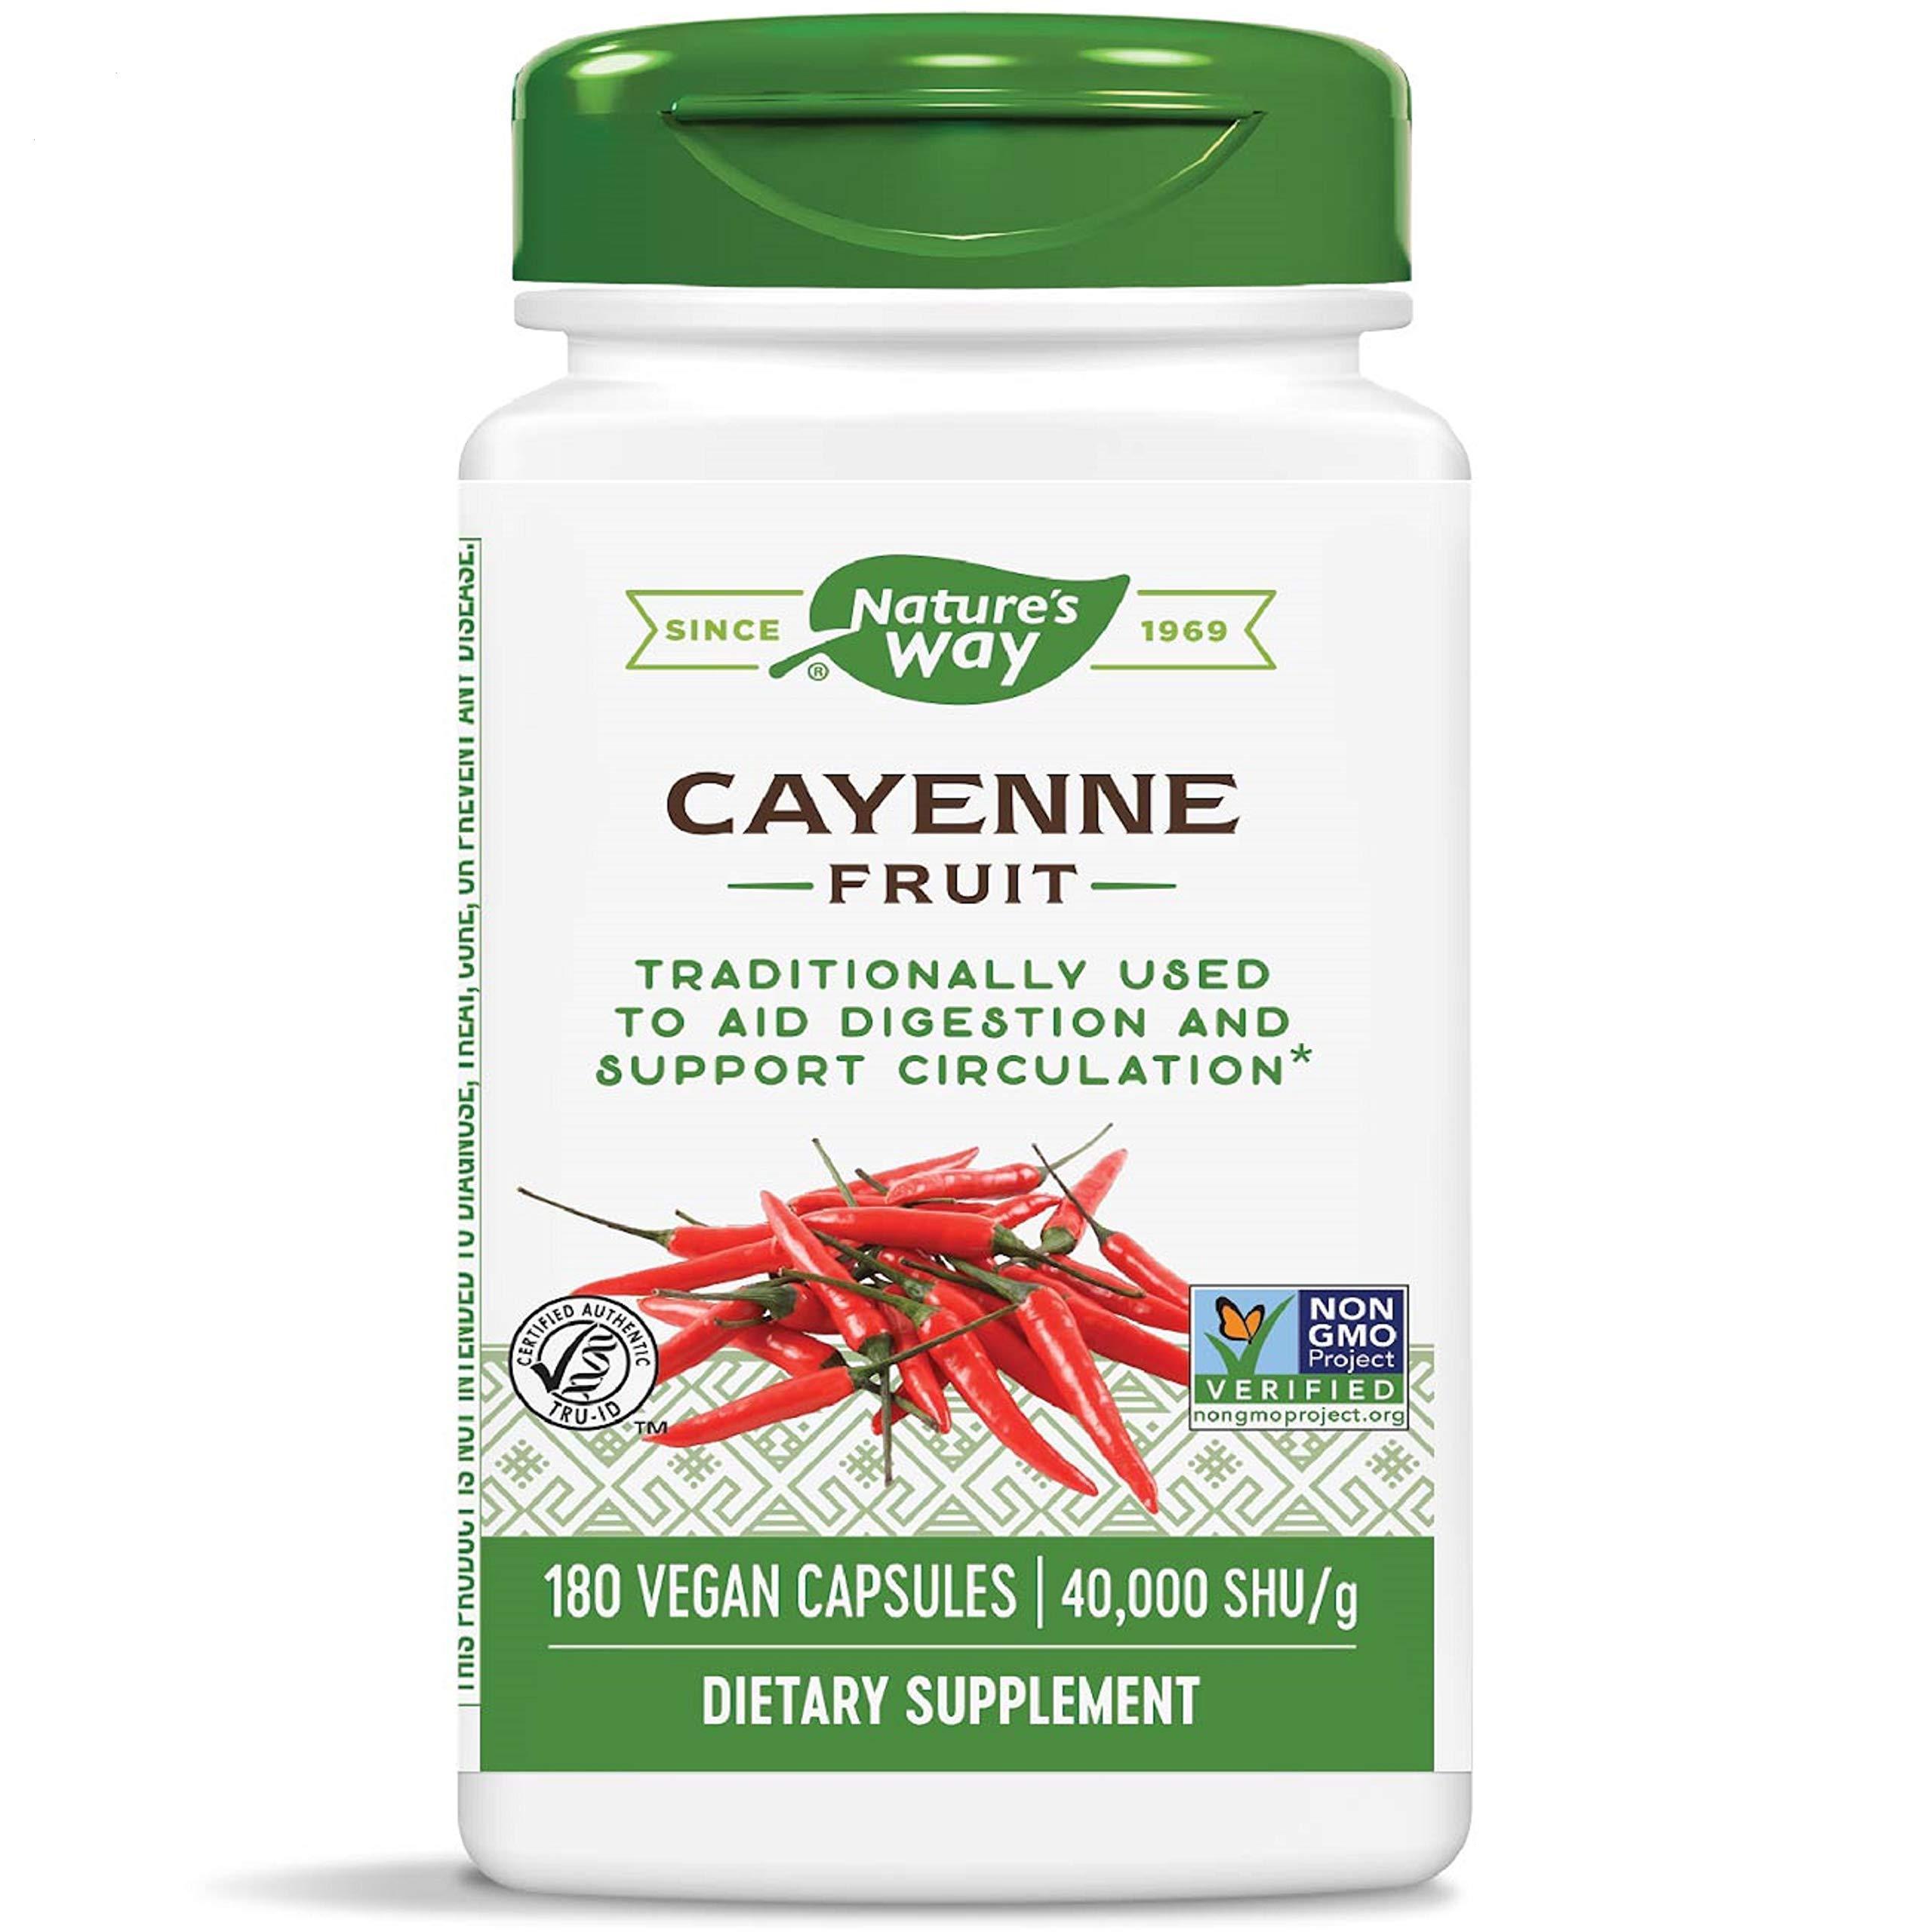 Nature's Way Cayenne Pepper 40,000 SHU Potency, Non-GMO & Gluten Free, Vegetarian Capsules, 180 Count